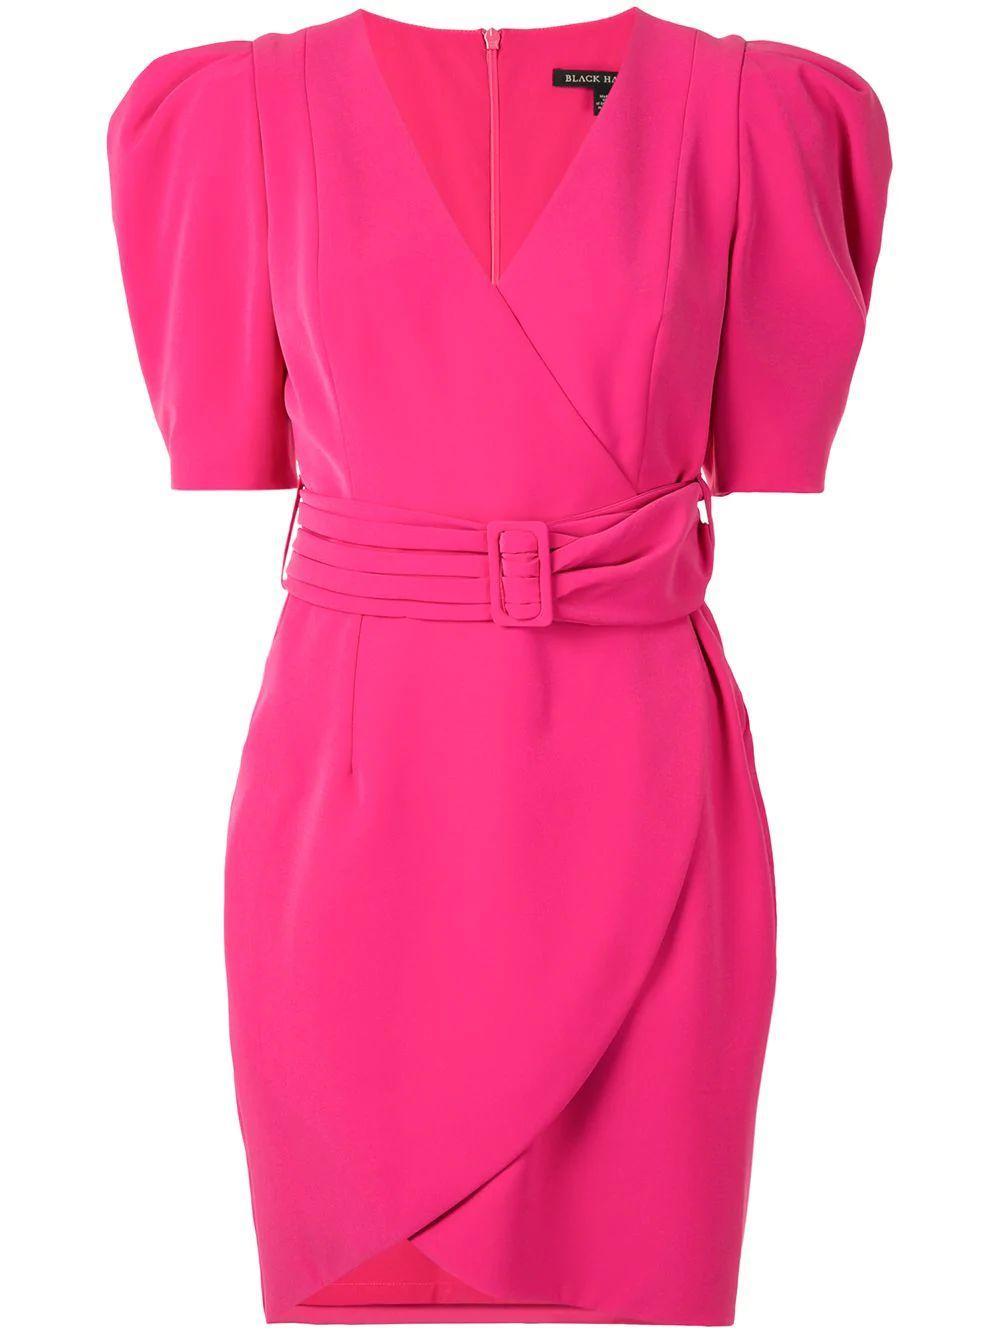 Maricopa Puff Sleeve Belted Dress Item # 6602339